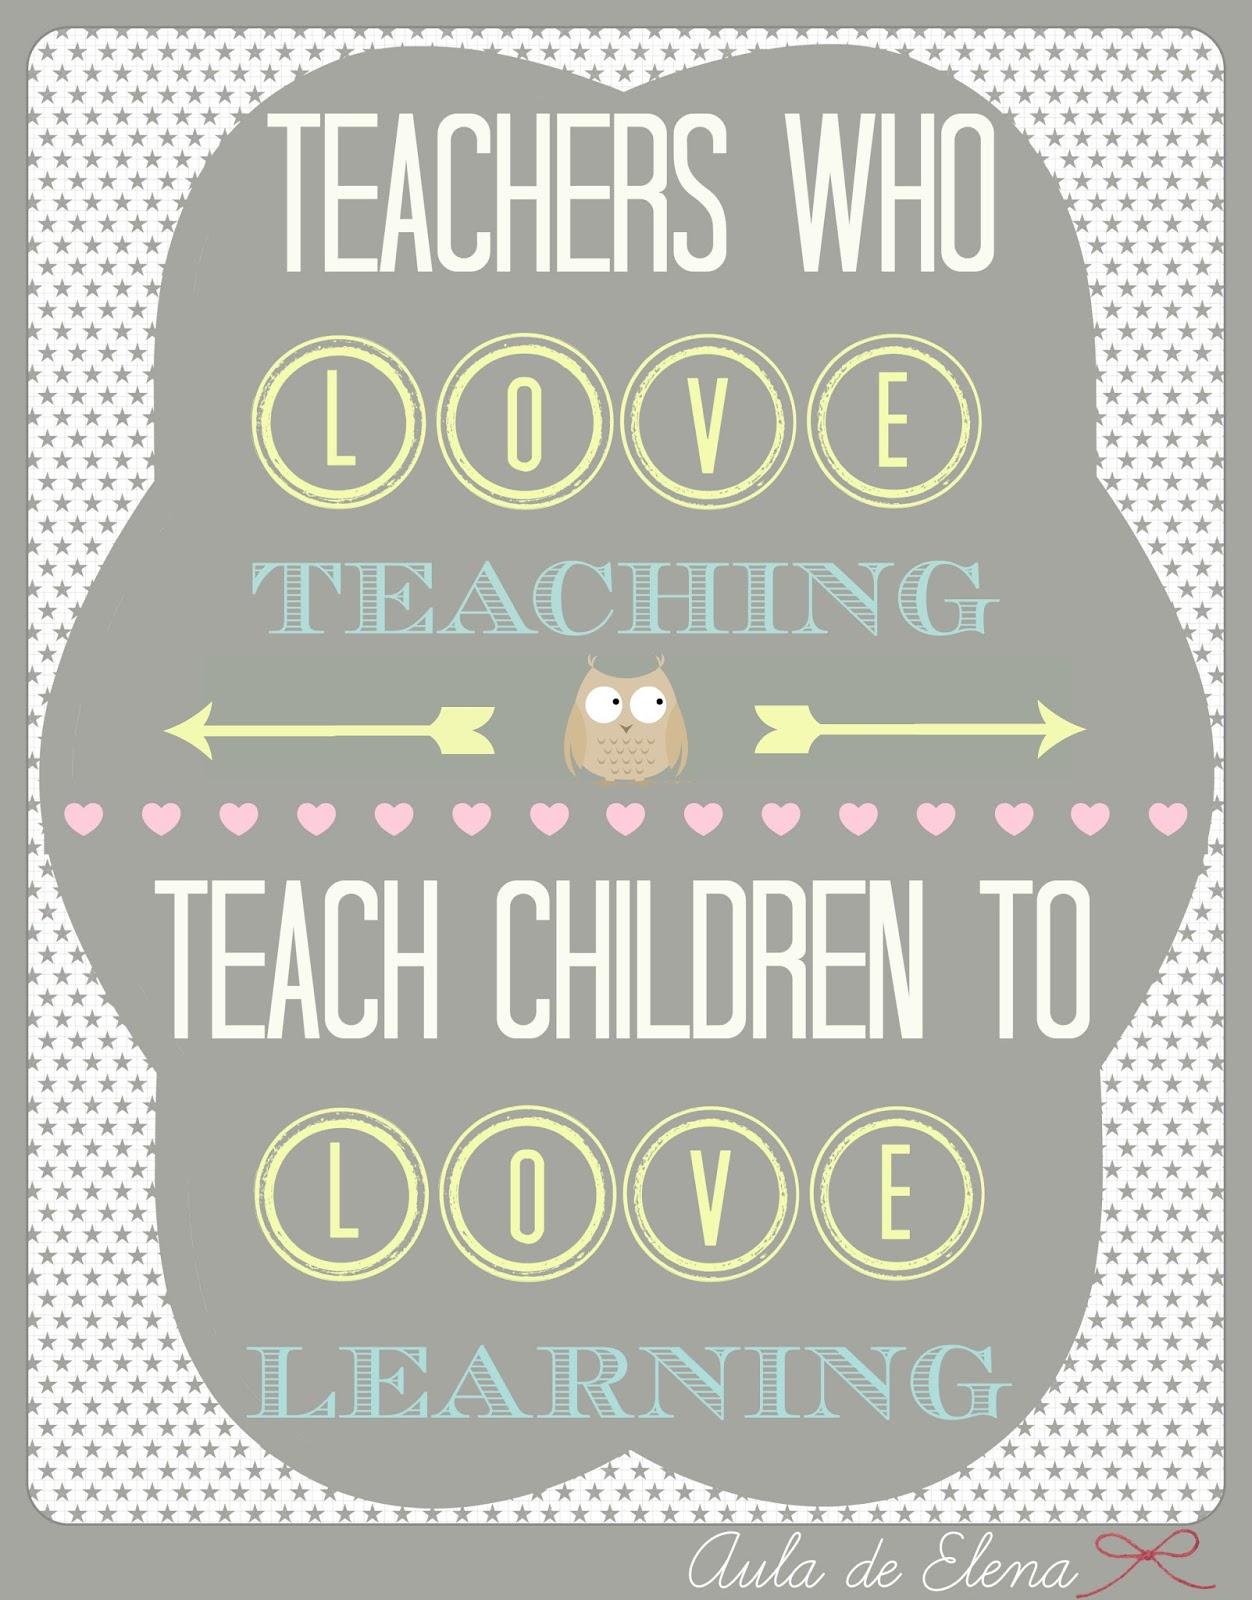 Aula de Elena: Los profesores que aman enseñar